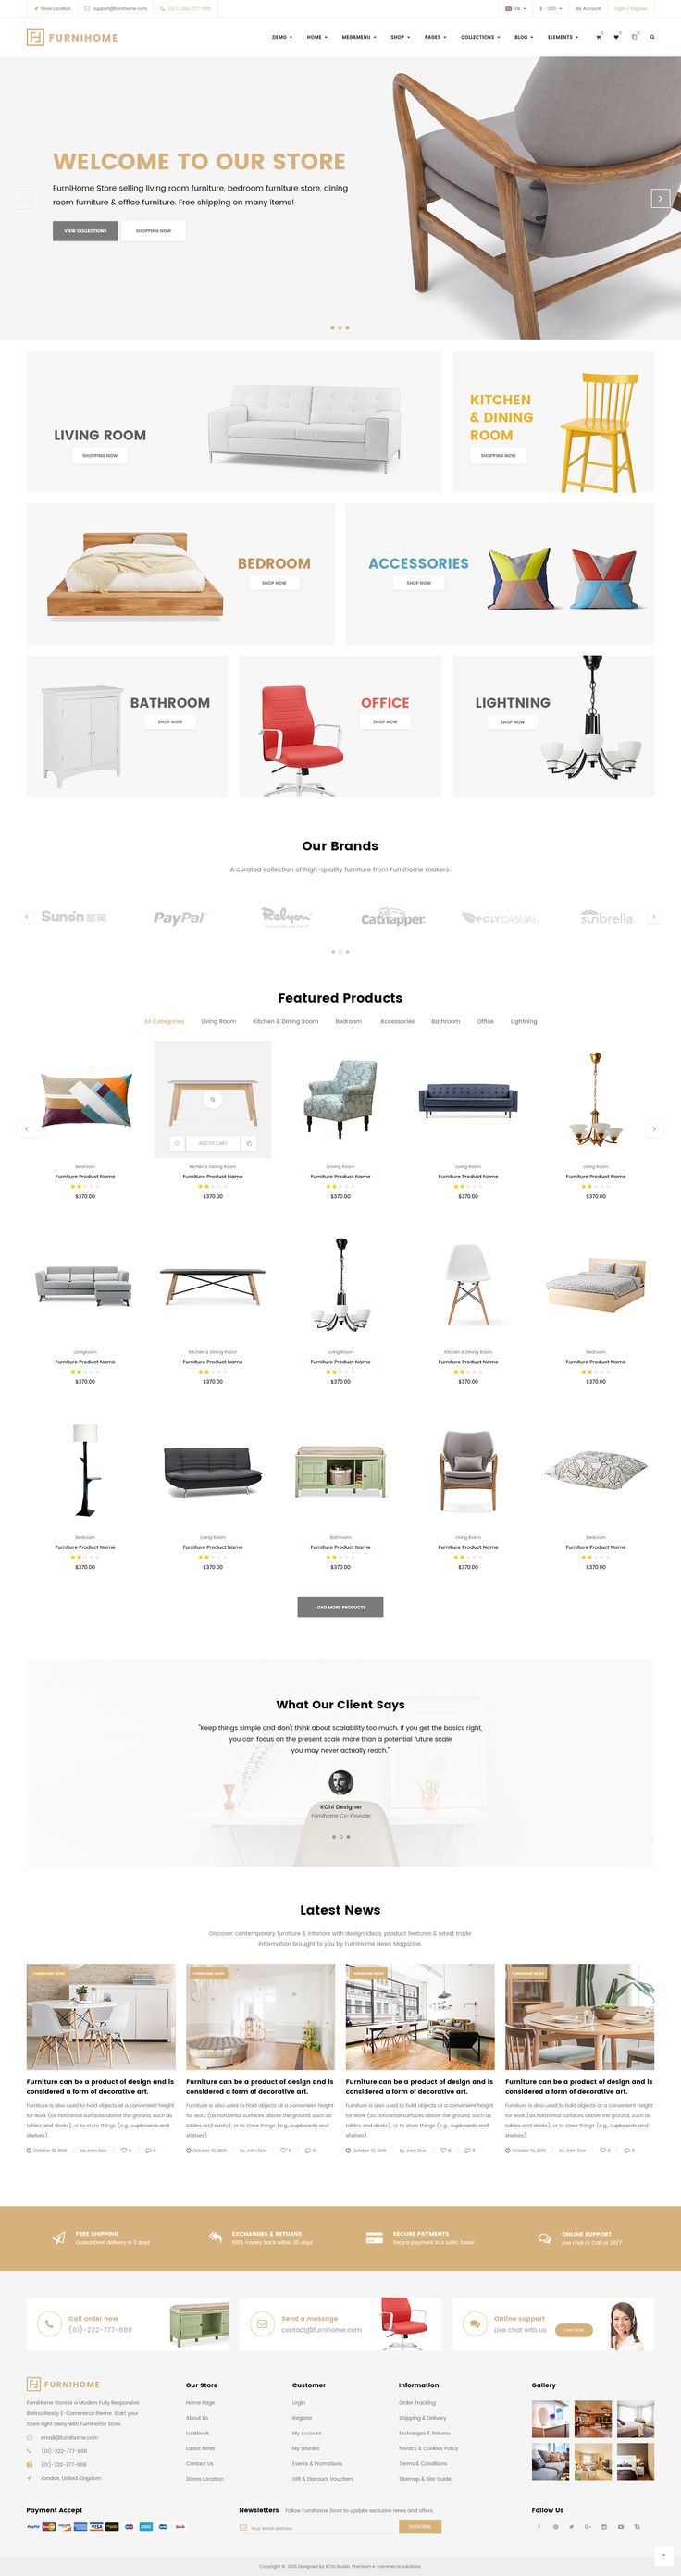 Furnihome - E-Commerce PSD Template for Furniture Store #psd #psd #furniture store • Download ➝ https://themeforest.net/item/furnihome-ecommerce-psd-template-for-furniture-store/18977292?ref=pxcr